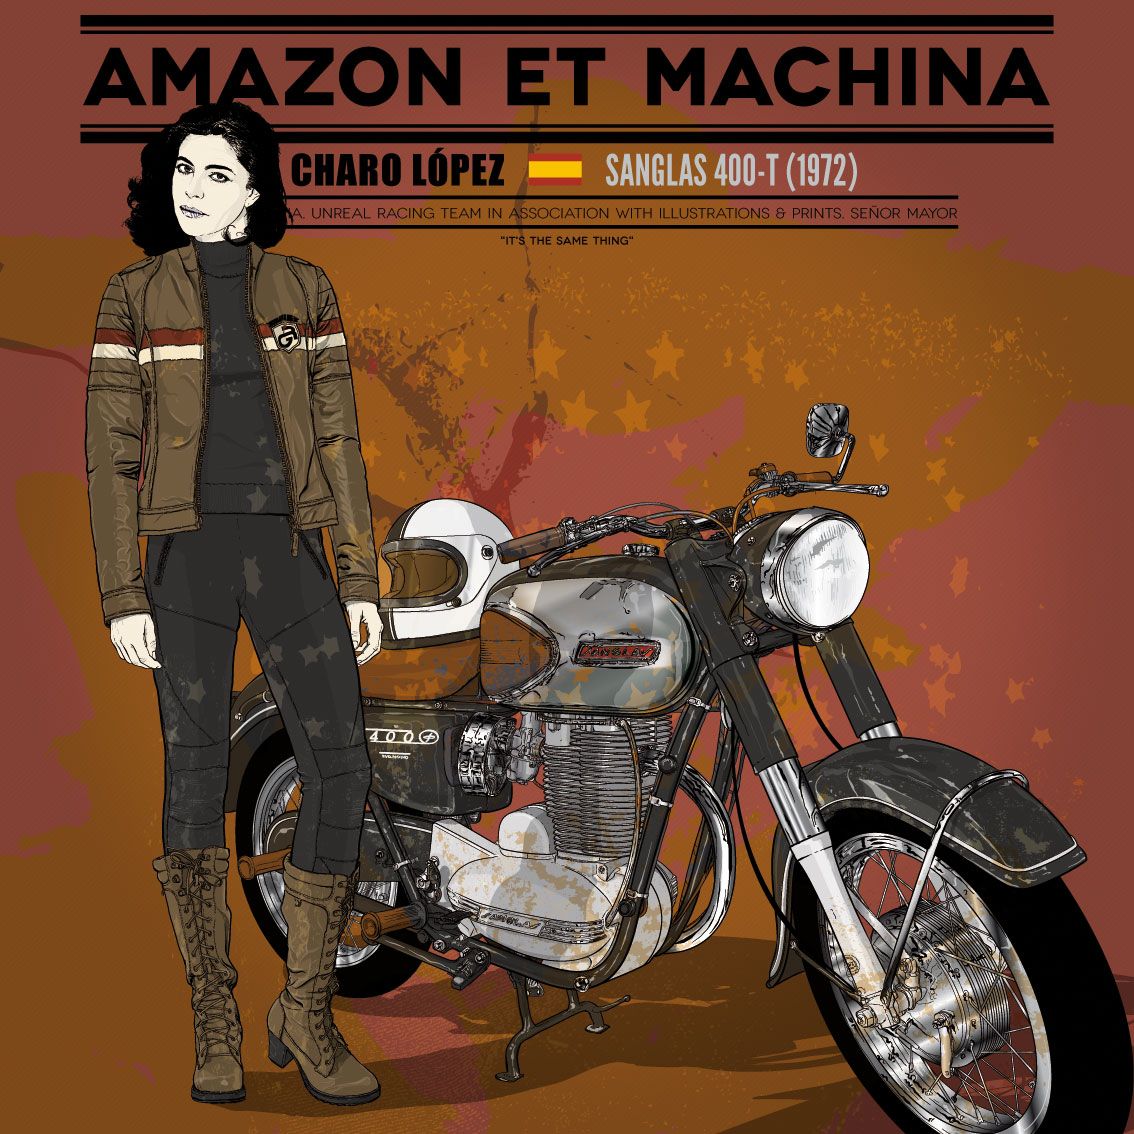 Charo y su Sanglas 400-T. Amazon et Machina